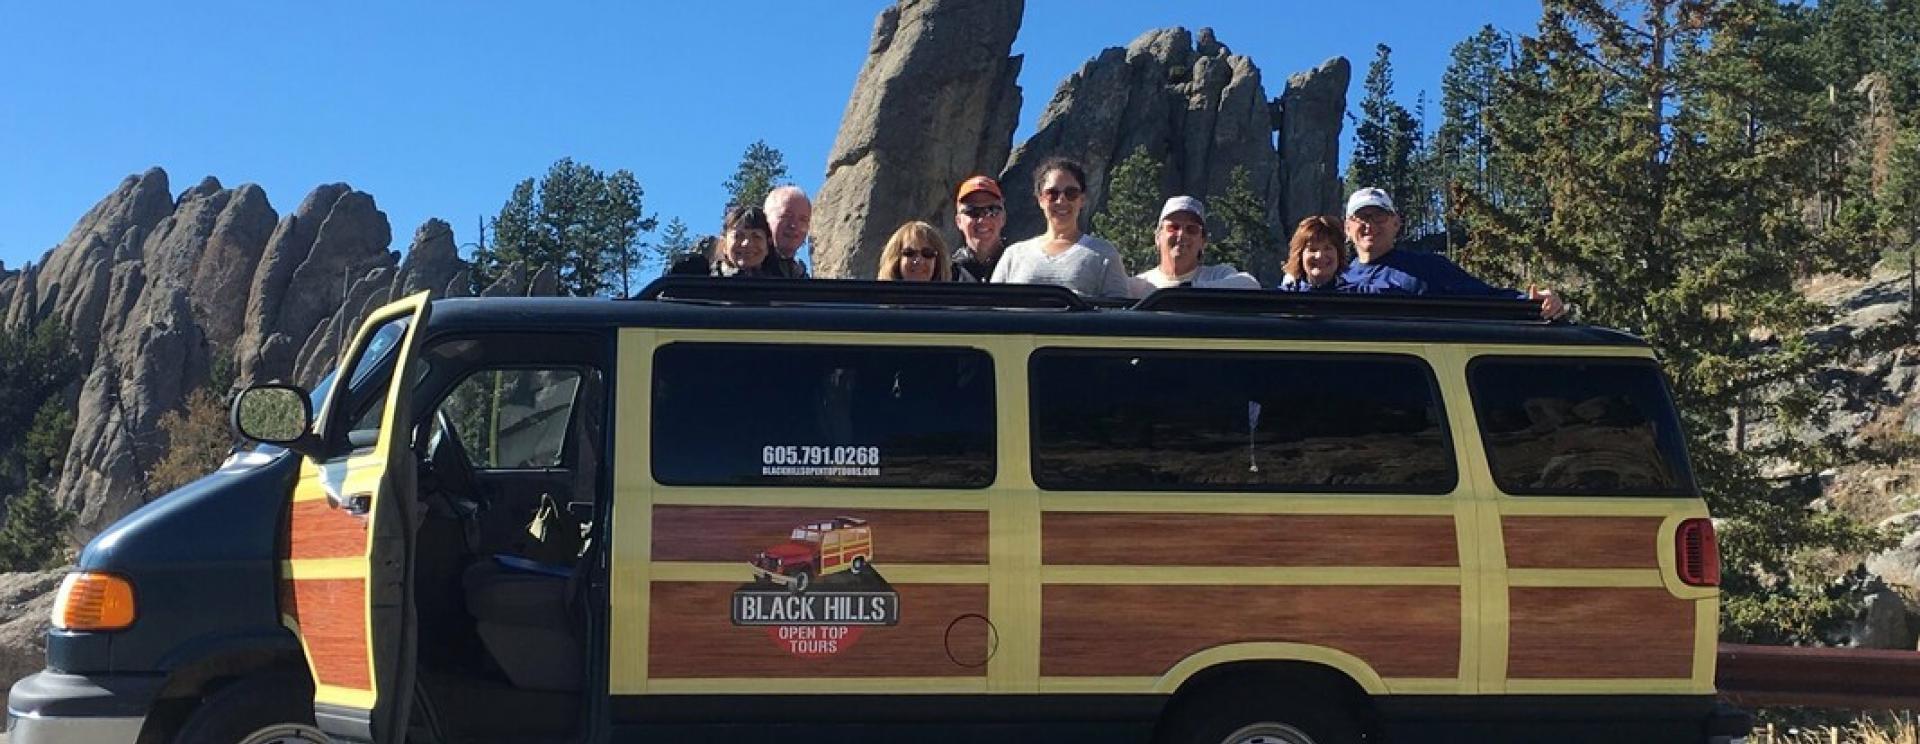 Black Hills Open Top Tours